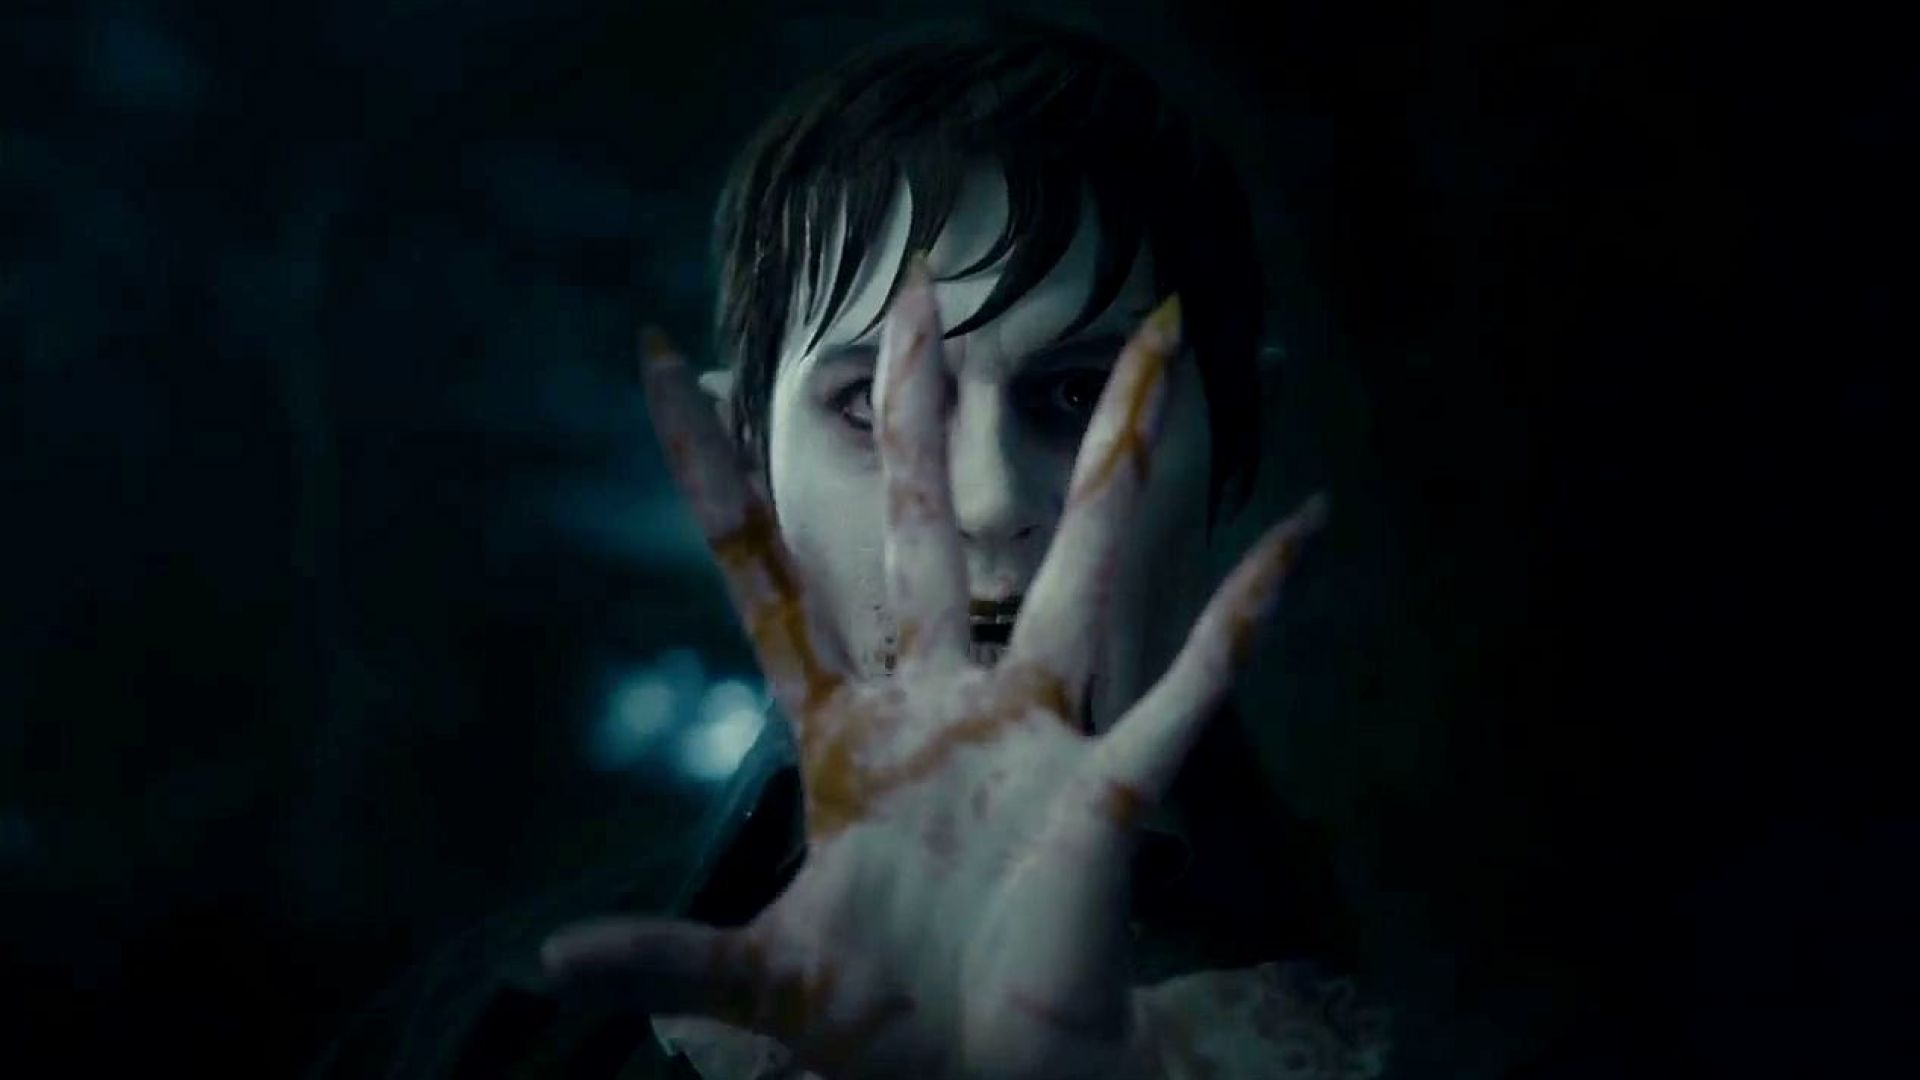 Johnny Depp hypnotizes Jackie Earle Haley in Dark Shadows